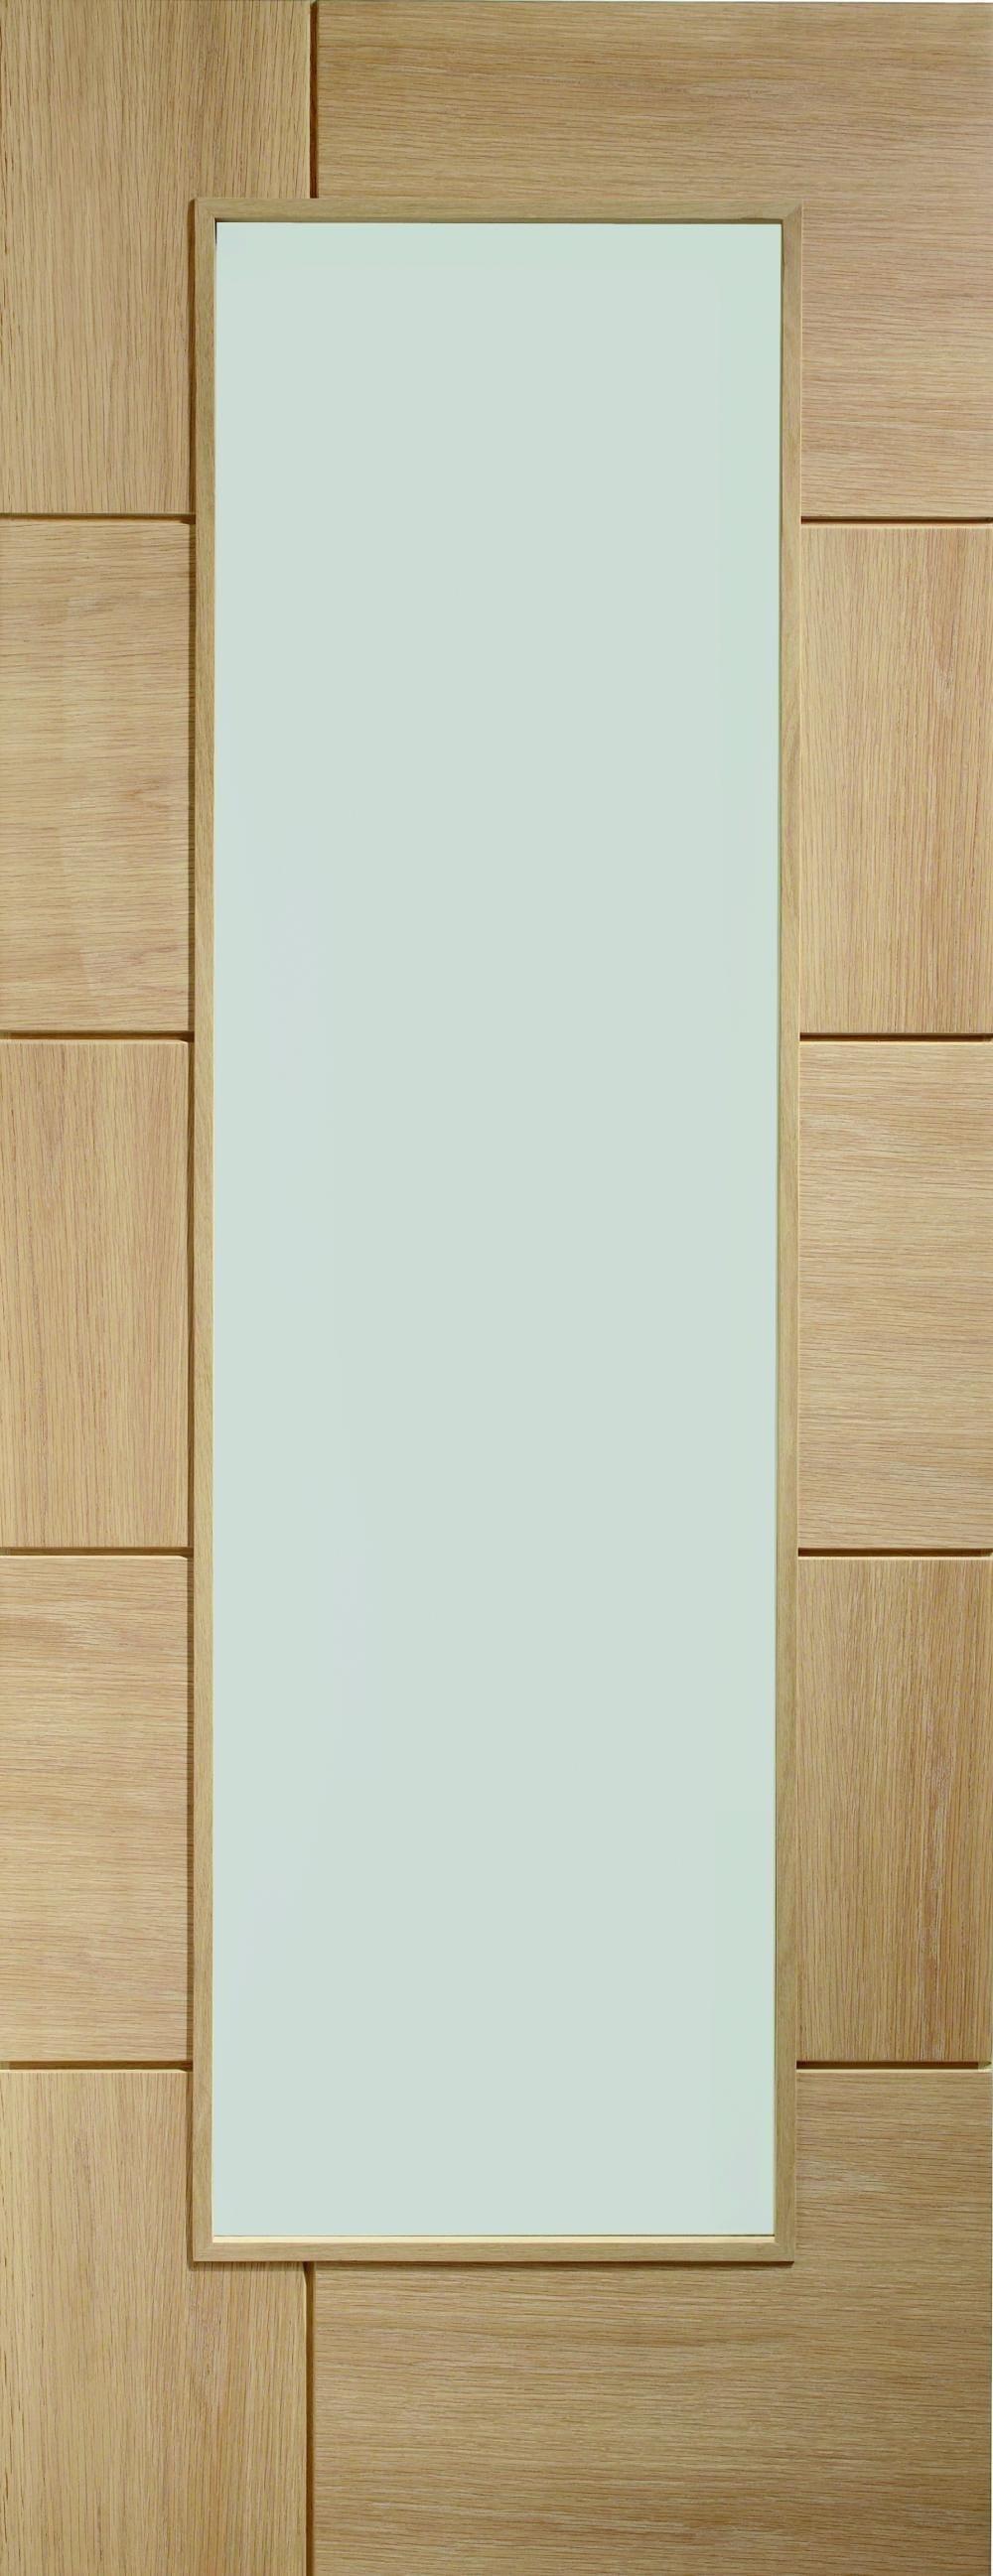 Ravenna Oak - Clear Glass Image